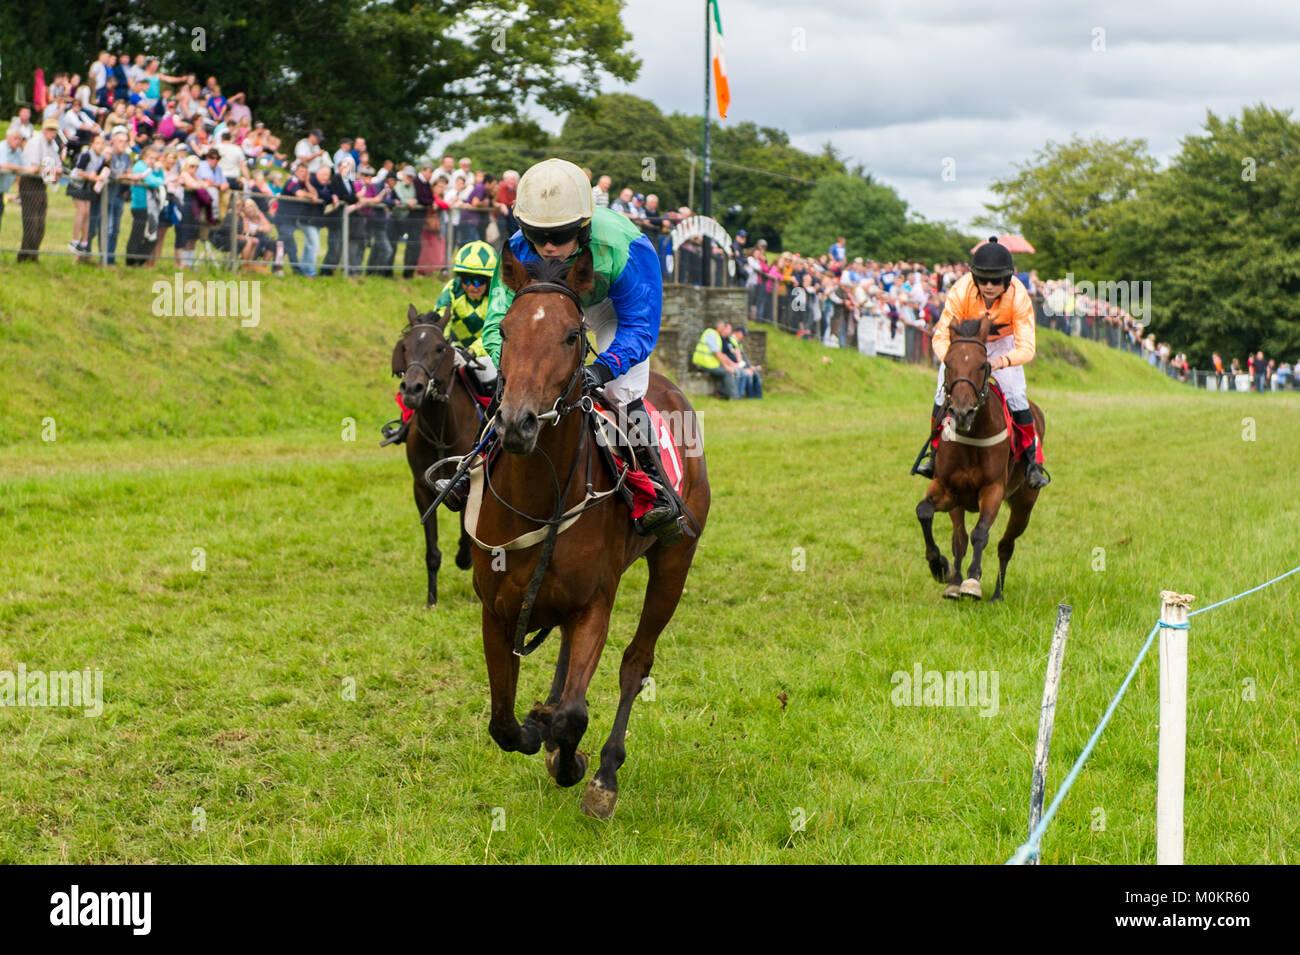 A juvenile horse race as part of Ballabuidhe Races, Dunmanway, County Cork, Ireland. - Stock Image